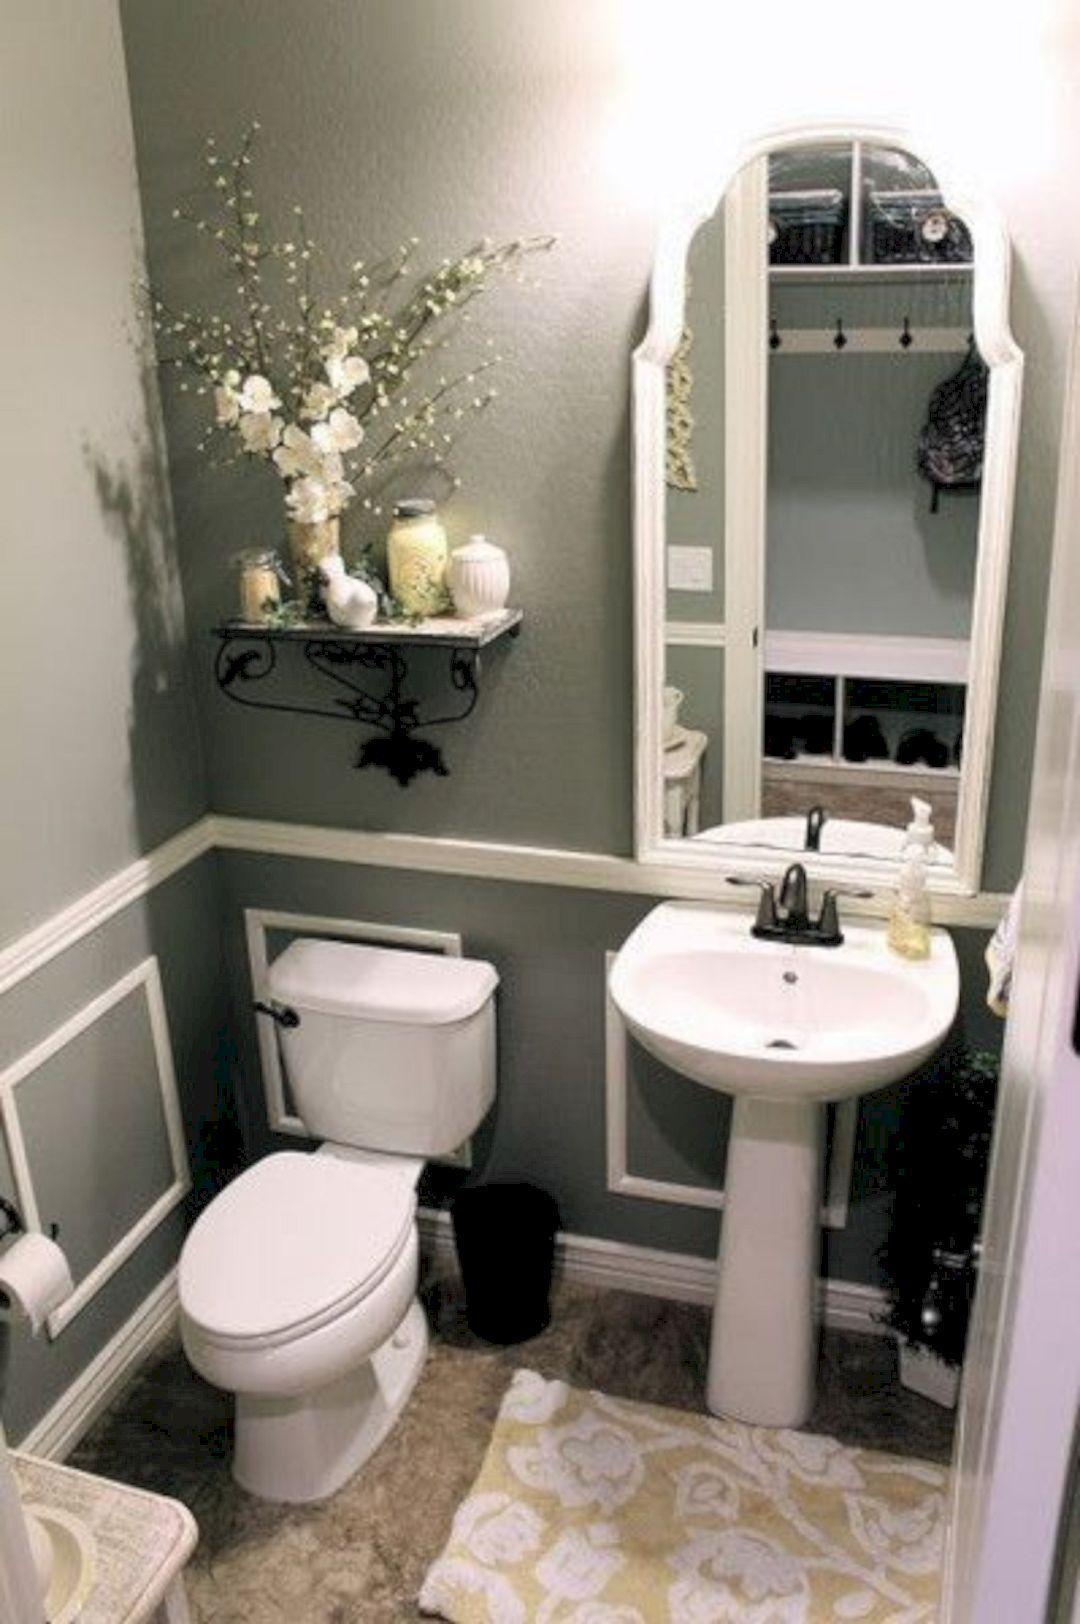 Badezimmerdesigns 8 x 6  awesome small bathroom decorating ideas